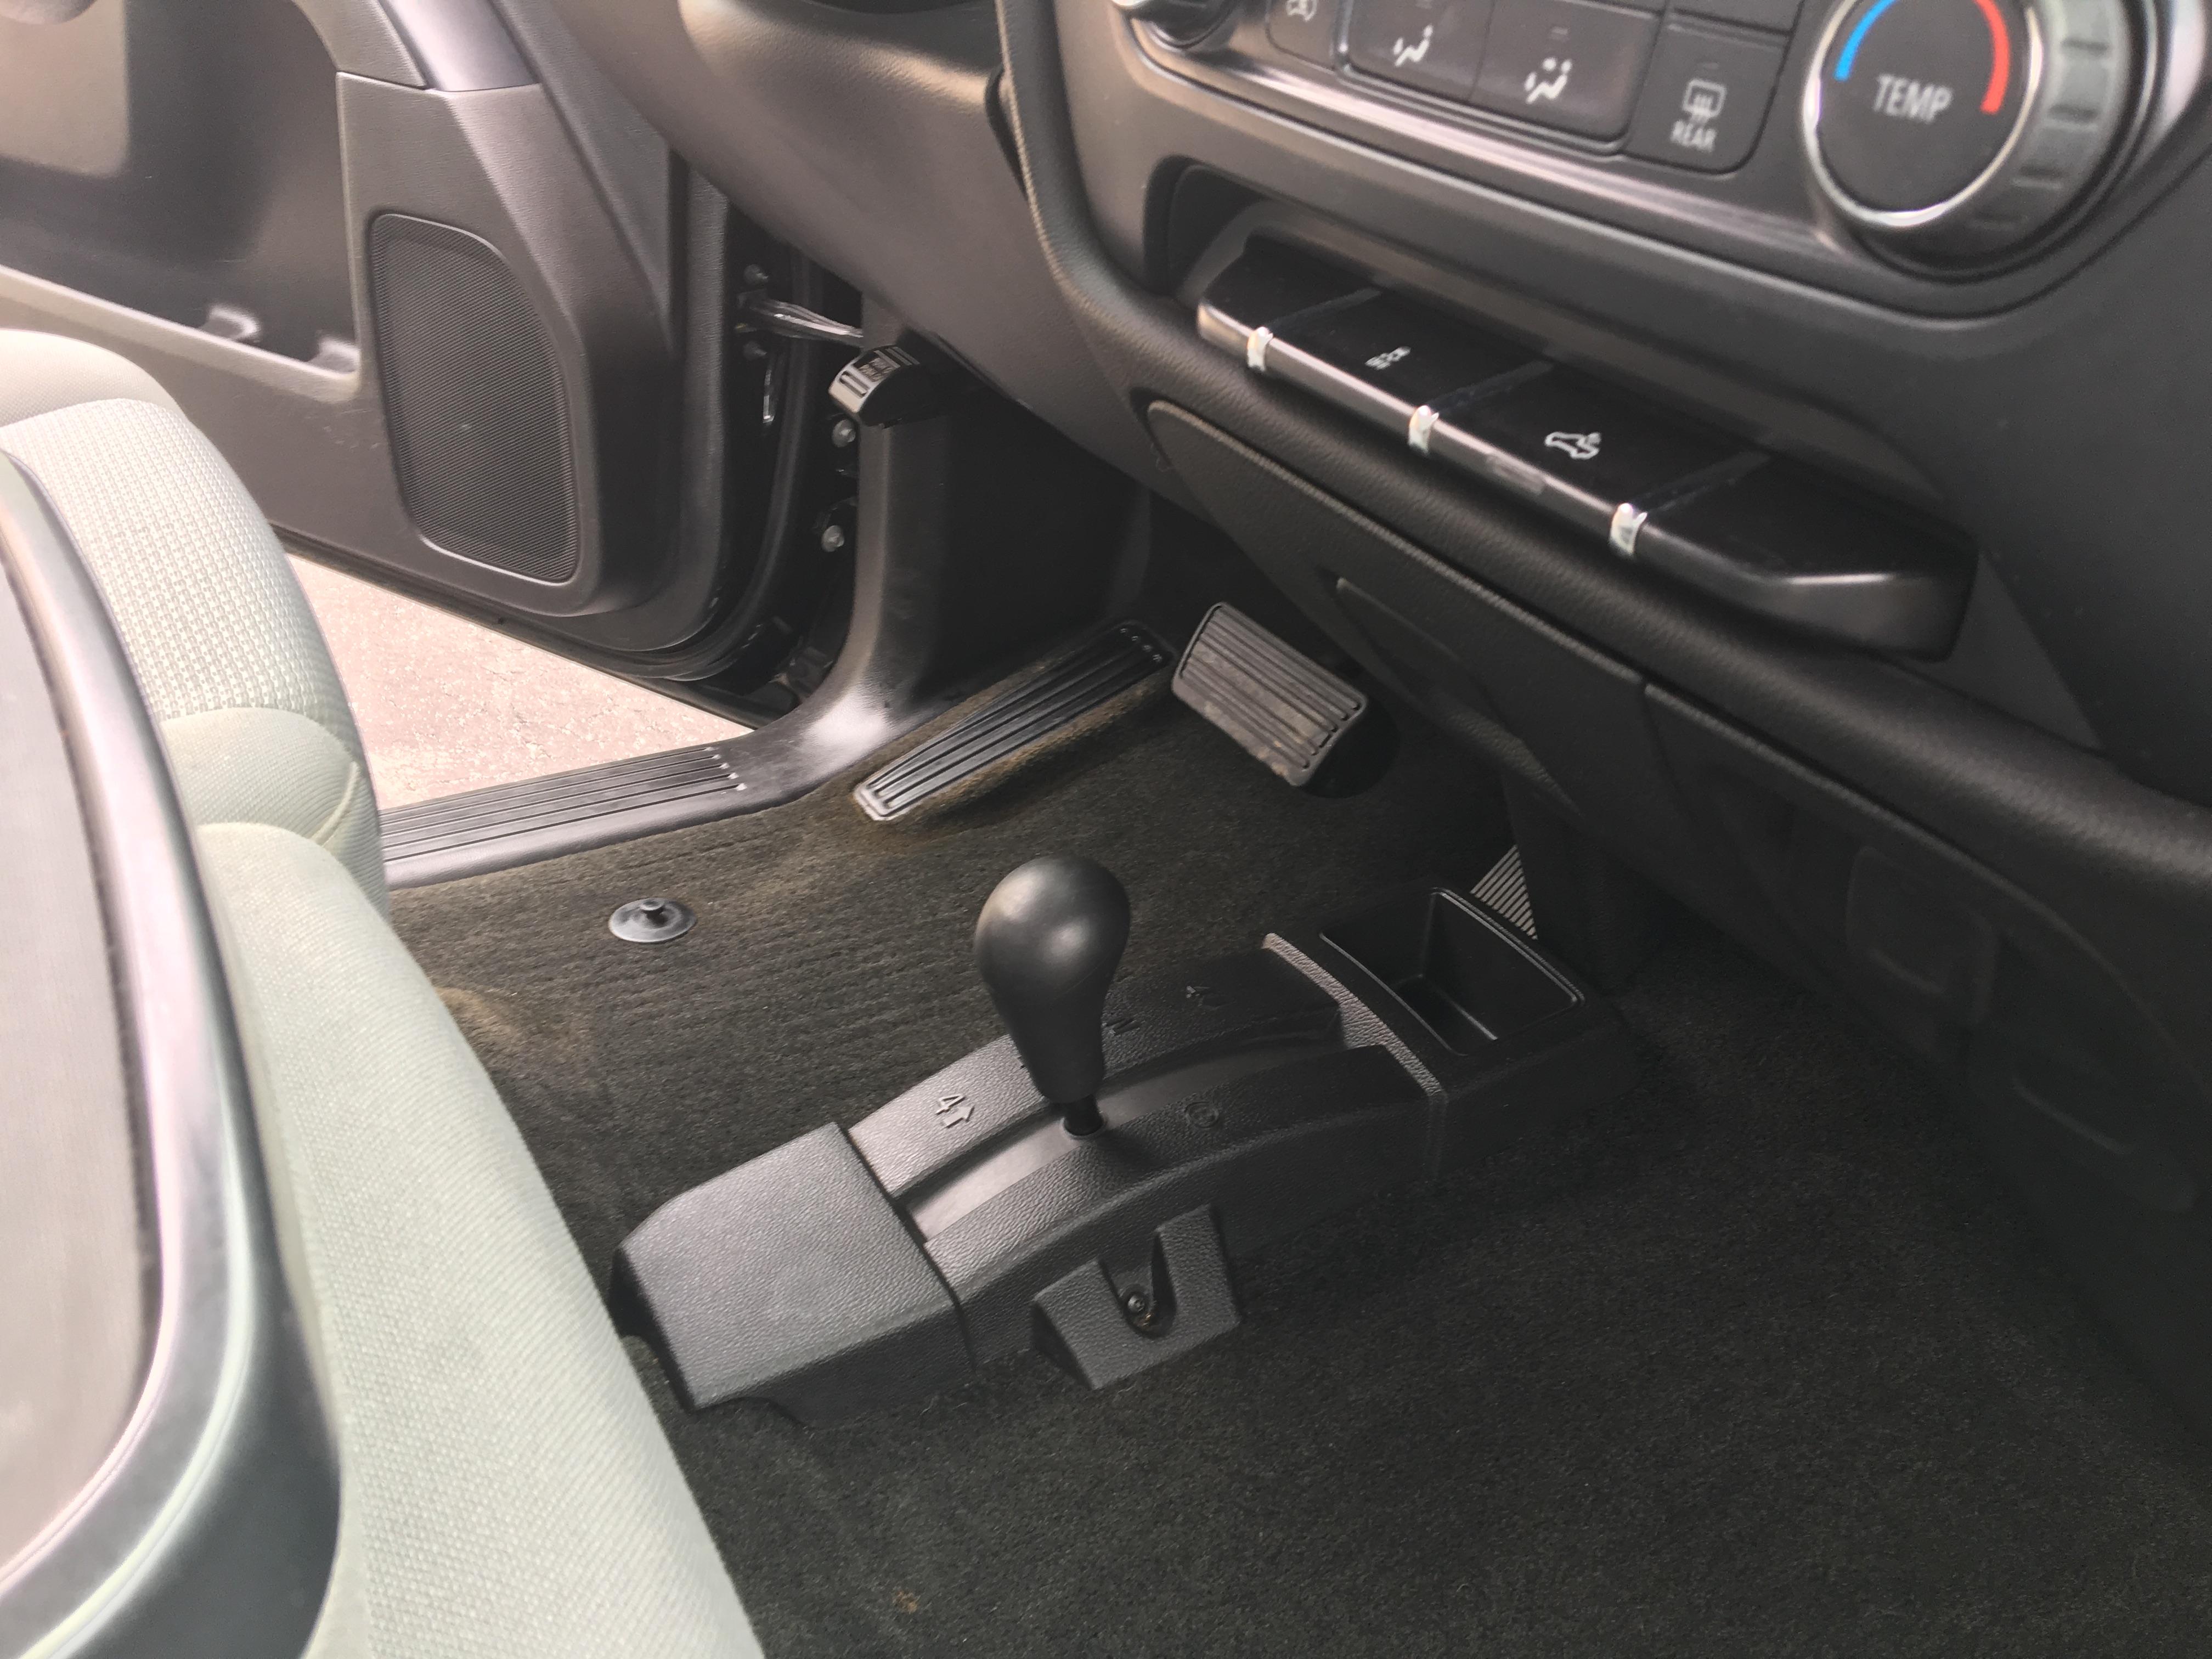 2014 GMC Sierra 1500 4x4 Dble Cab